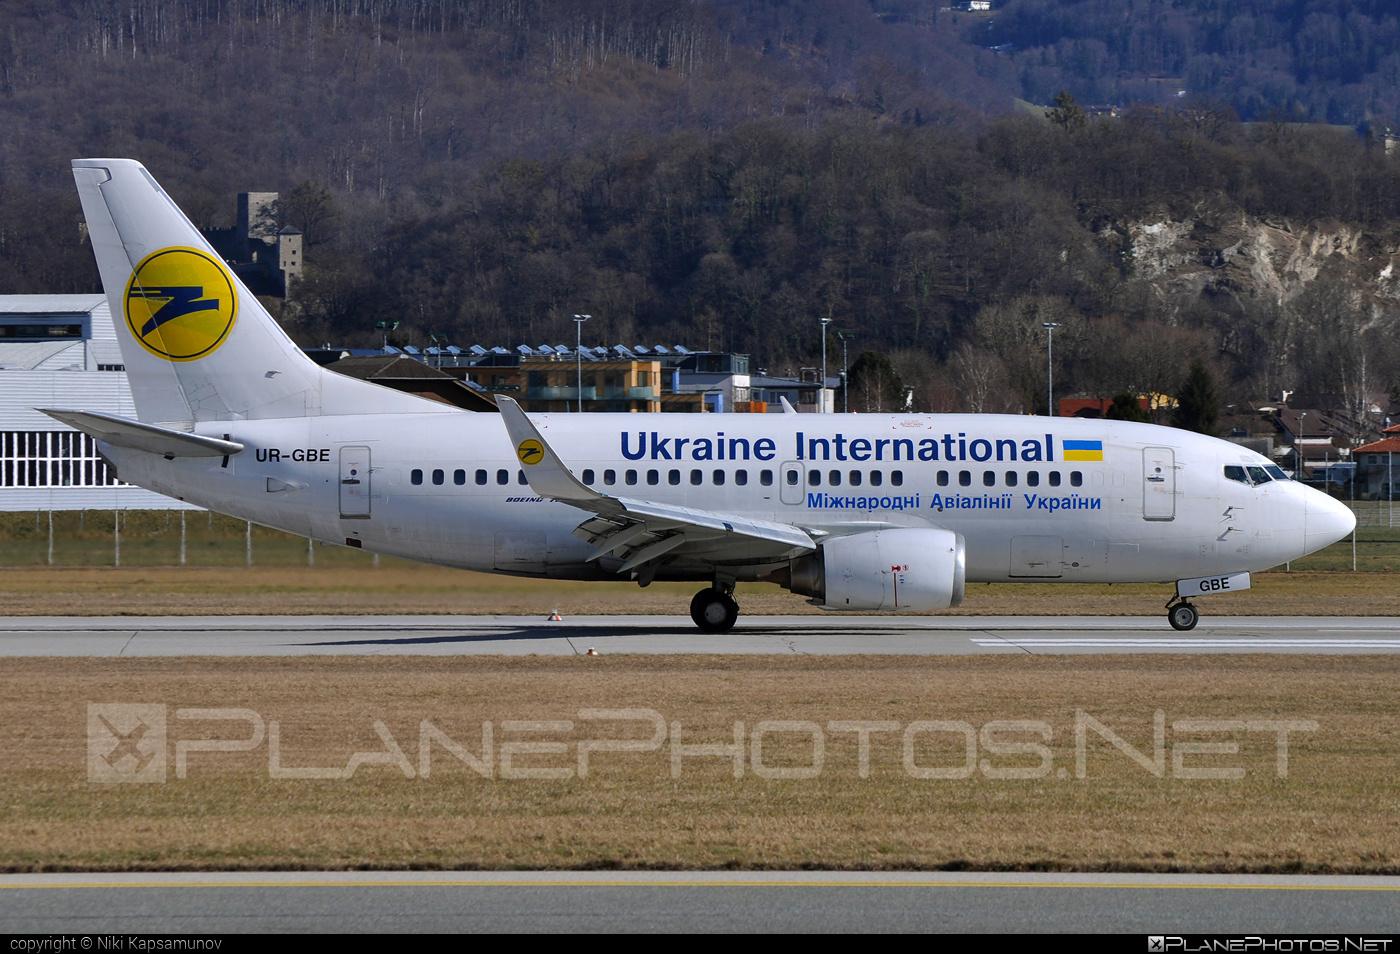 Boeing 737-500 - UR-GBE operated by Ukraine International Airlines #b737 #boeing #boeing737 #uia #ukraineinternationalairlines